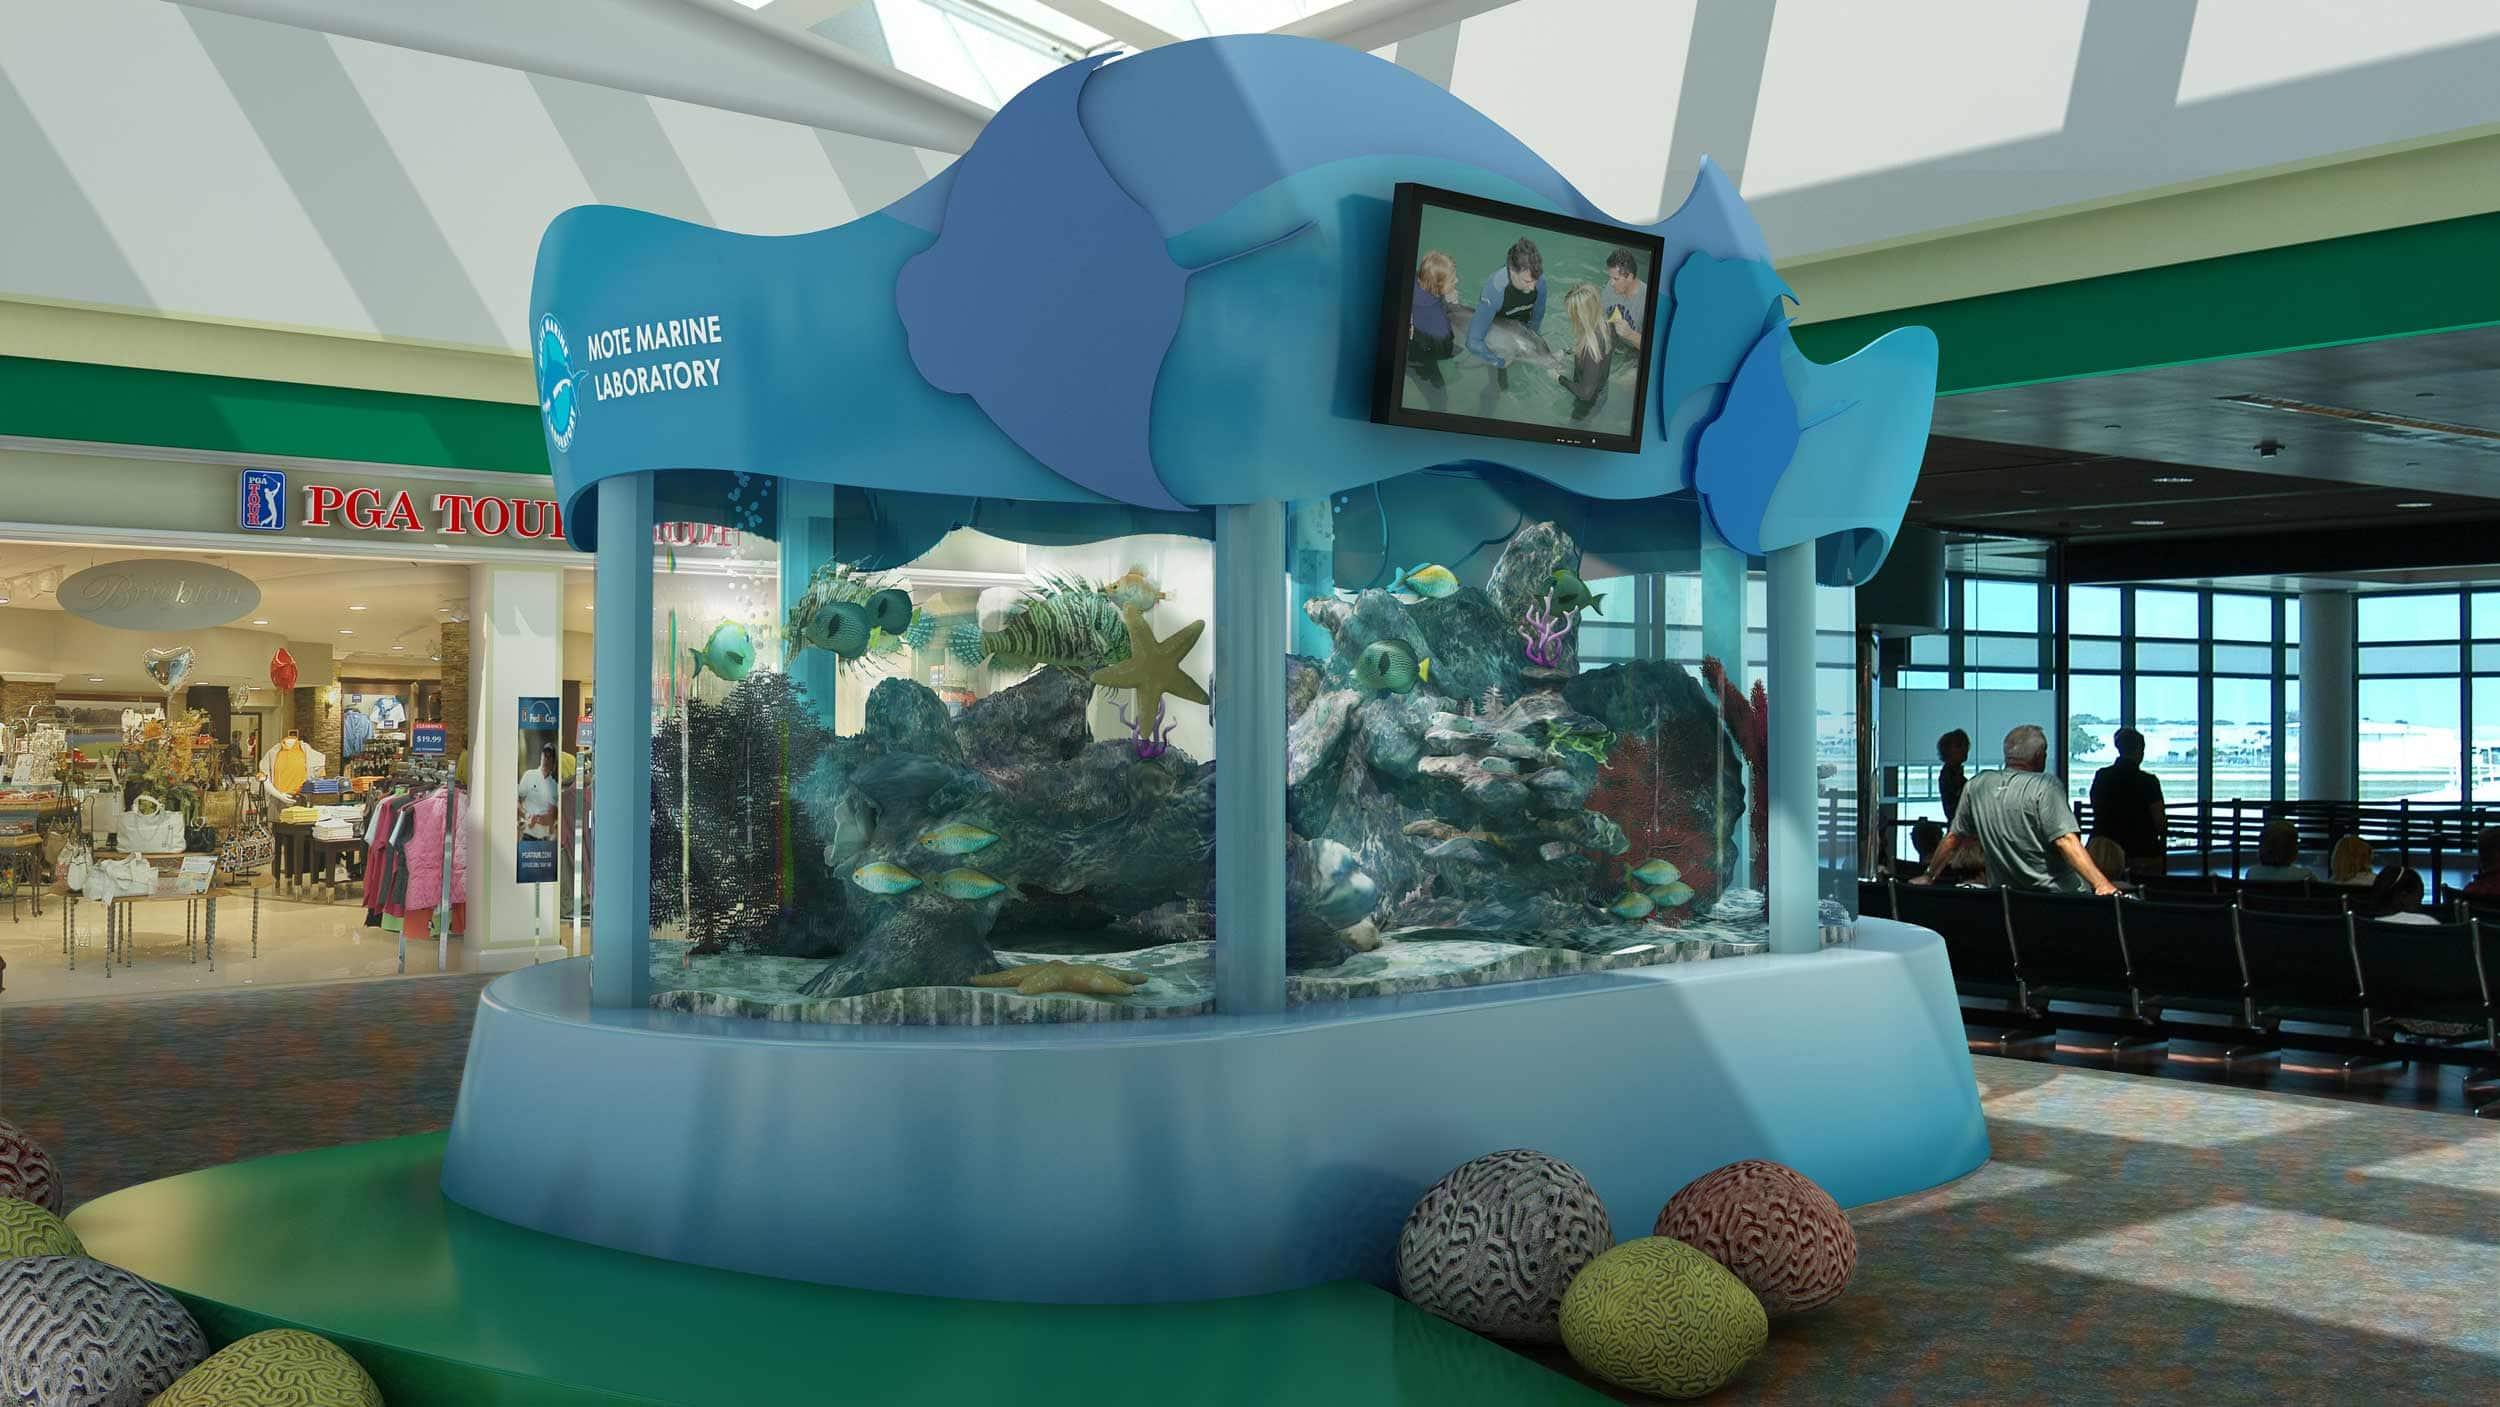 Mote Marine Srq 3d Aquarium Display In Sarasota Florida